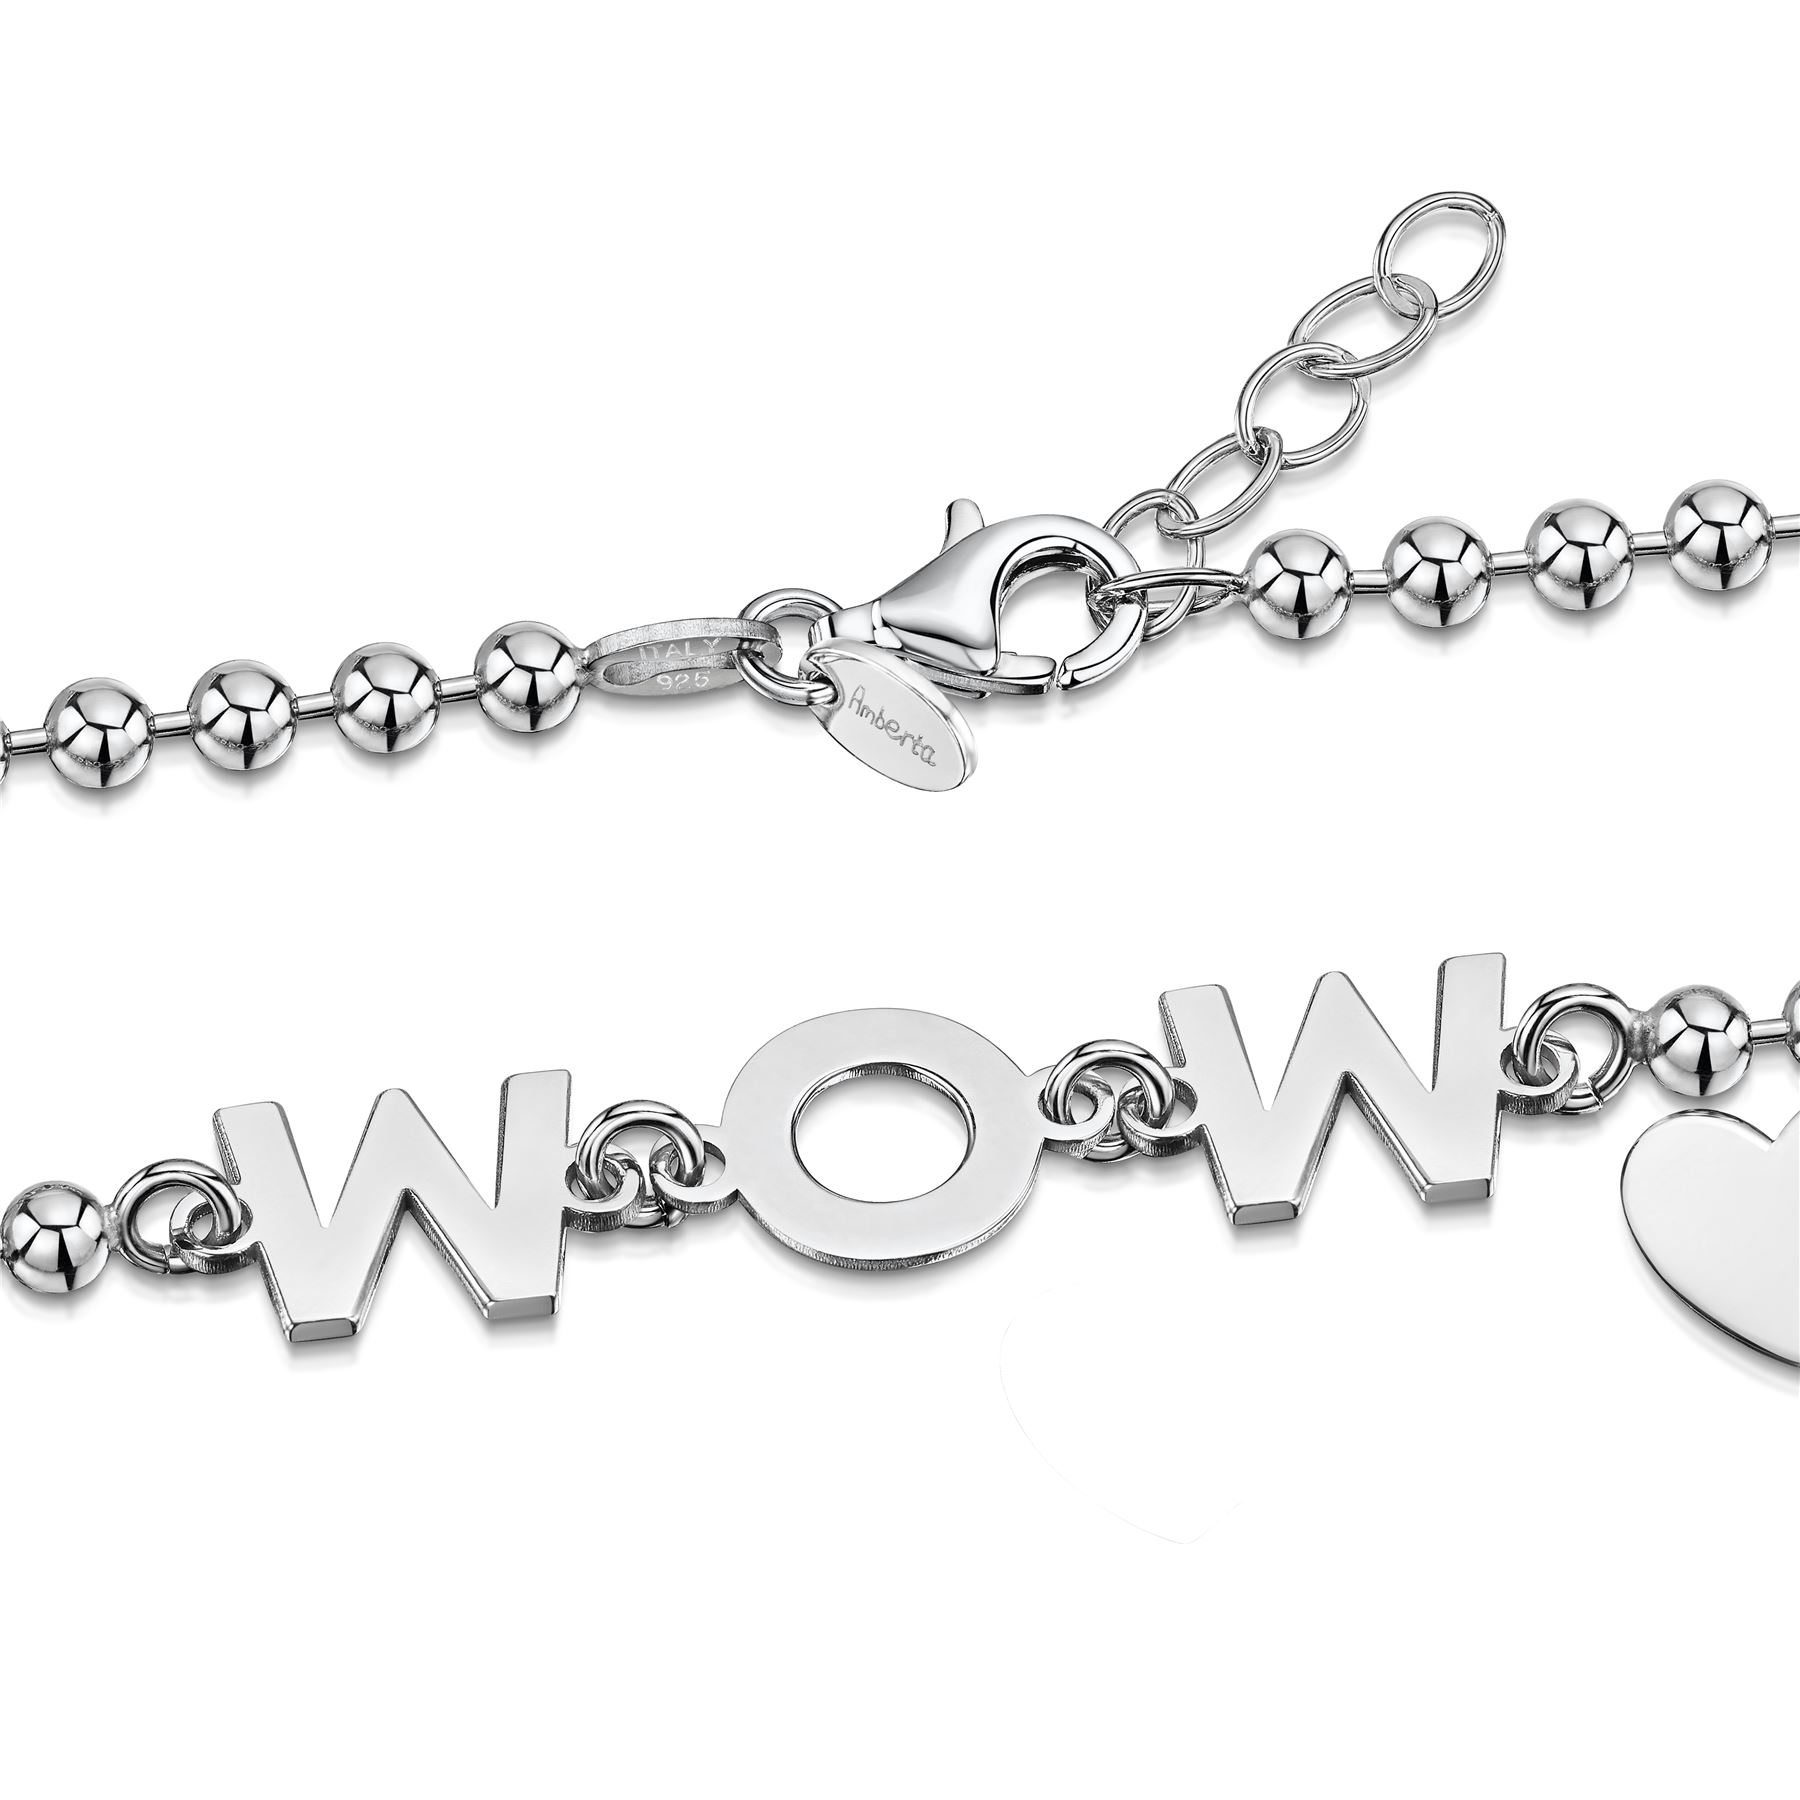 Amberta-Jewelry-925-Sterling-Silver-Adjustable-Bracelet-Italian-Bangle-for-Women miniature 83